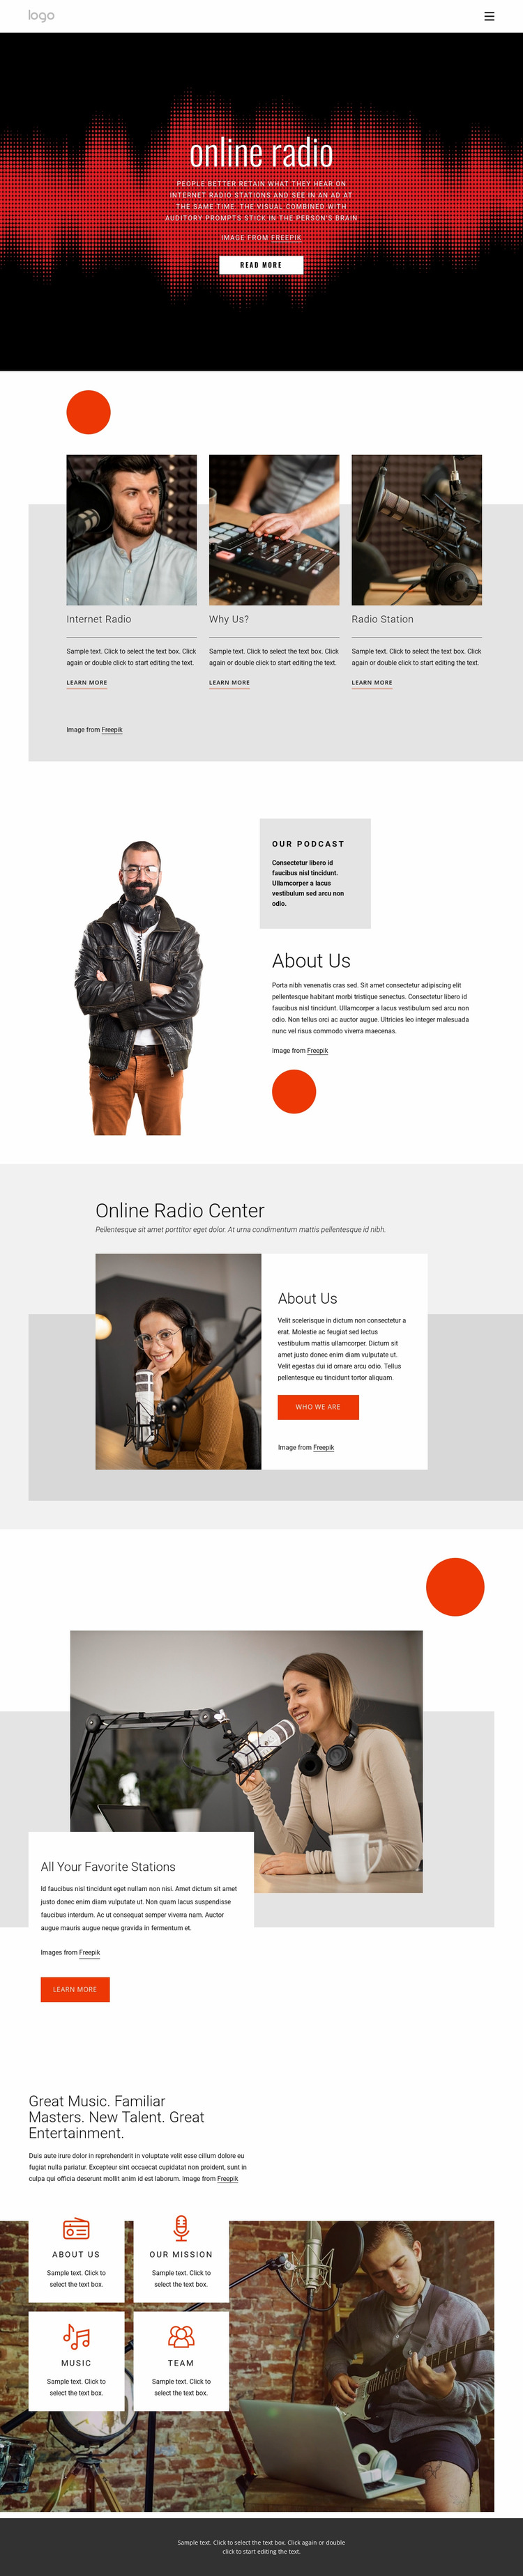 Online radio shows Website Mockup